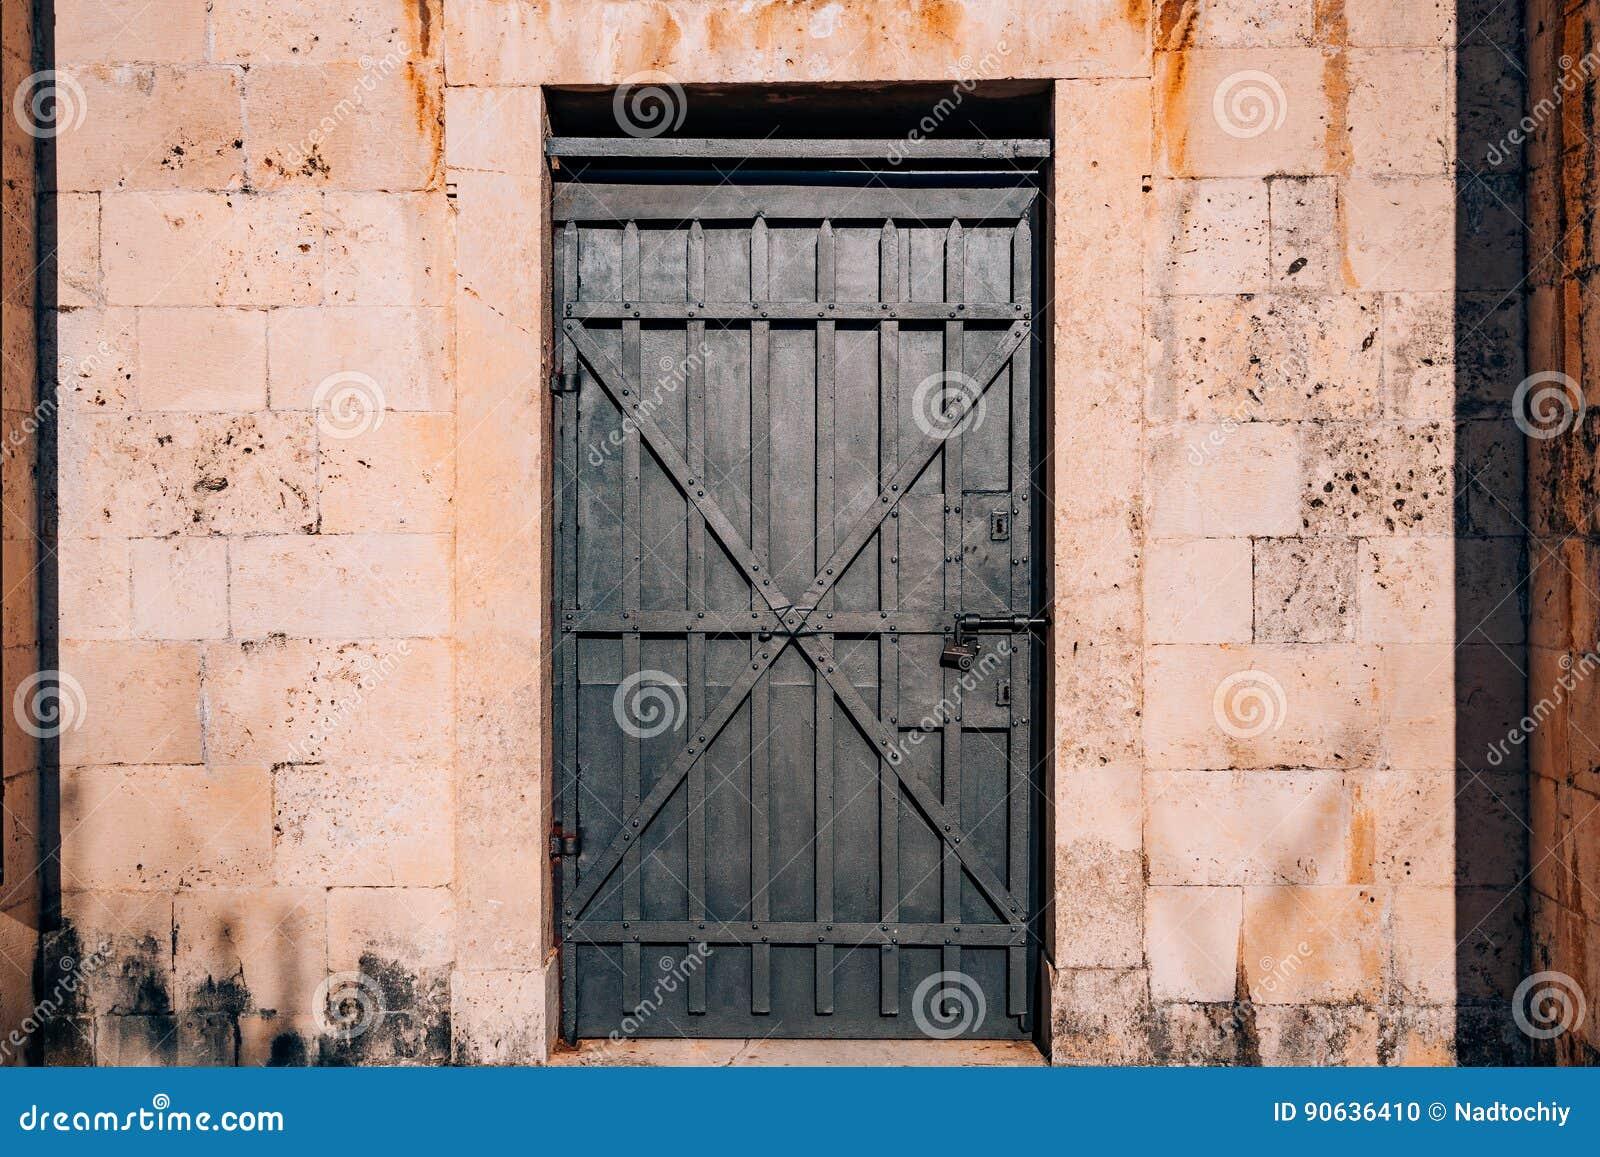 Schwarze Türen alte schwarze türen hölzerne beschaffenheit beschaffenheit des